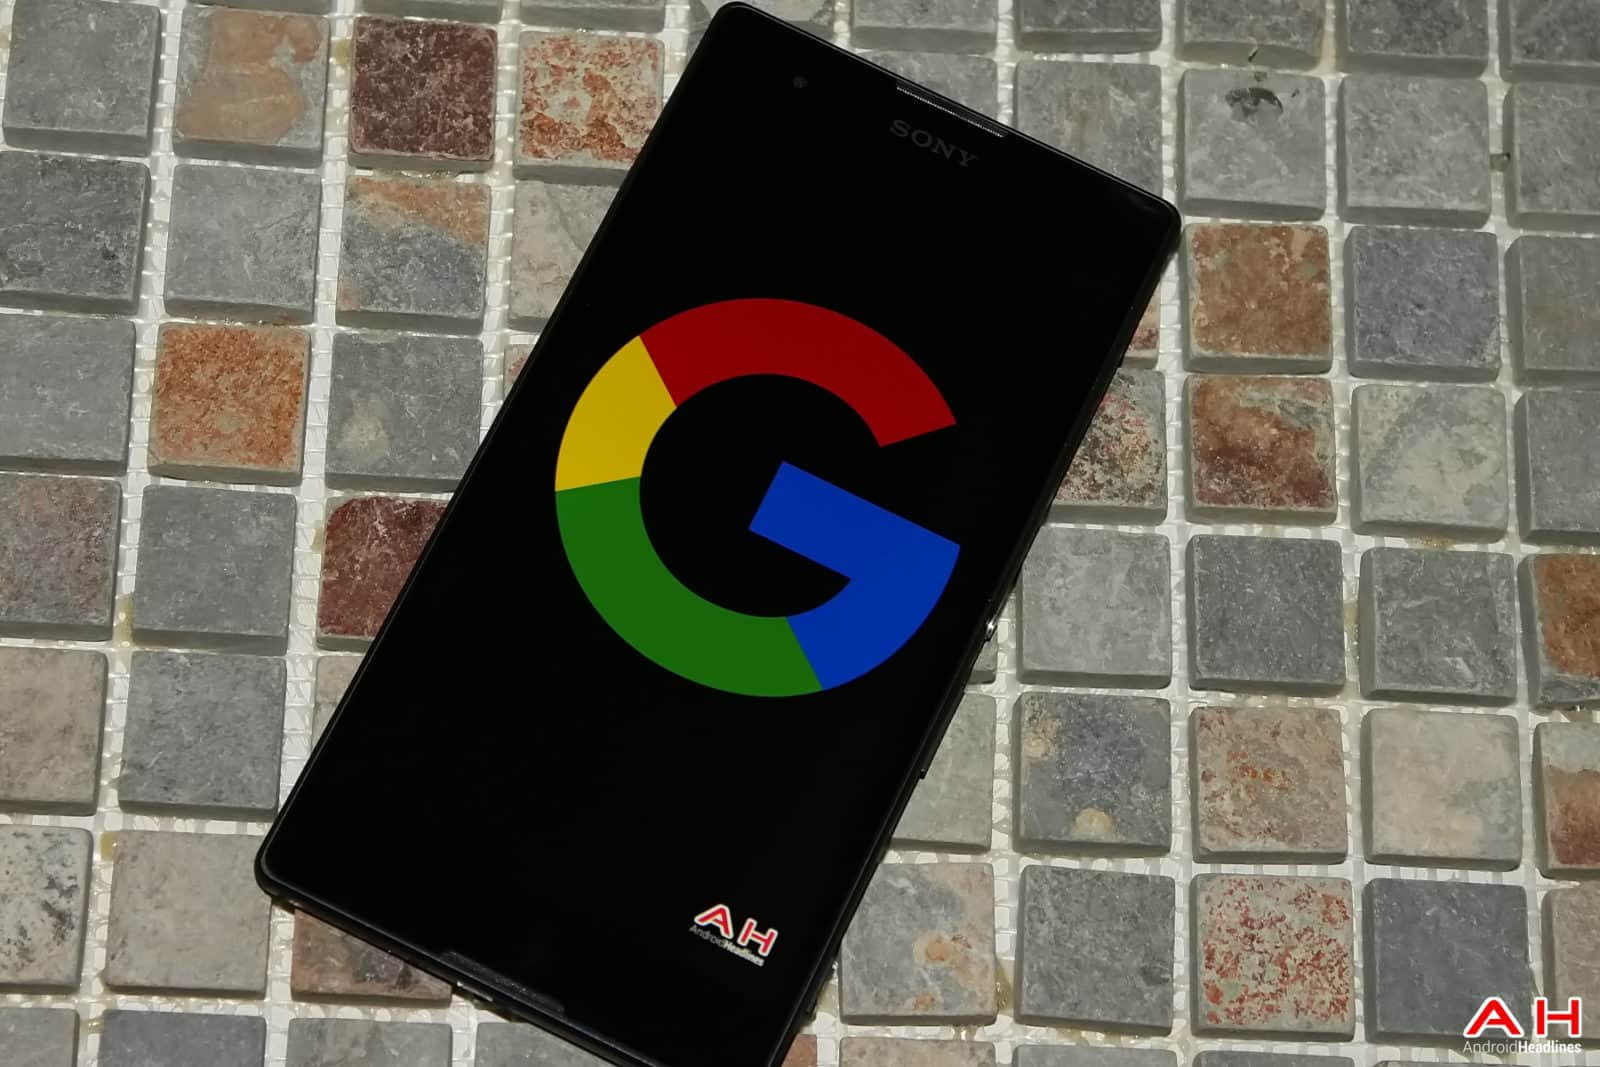 AH 2015 A New Google LOGO-173